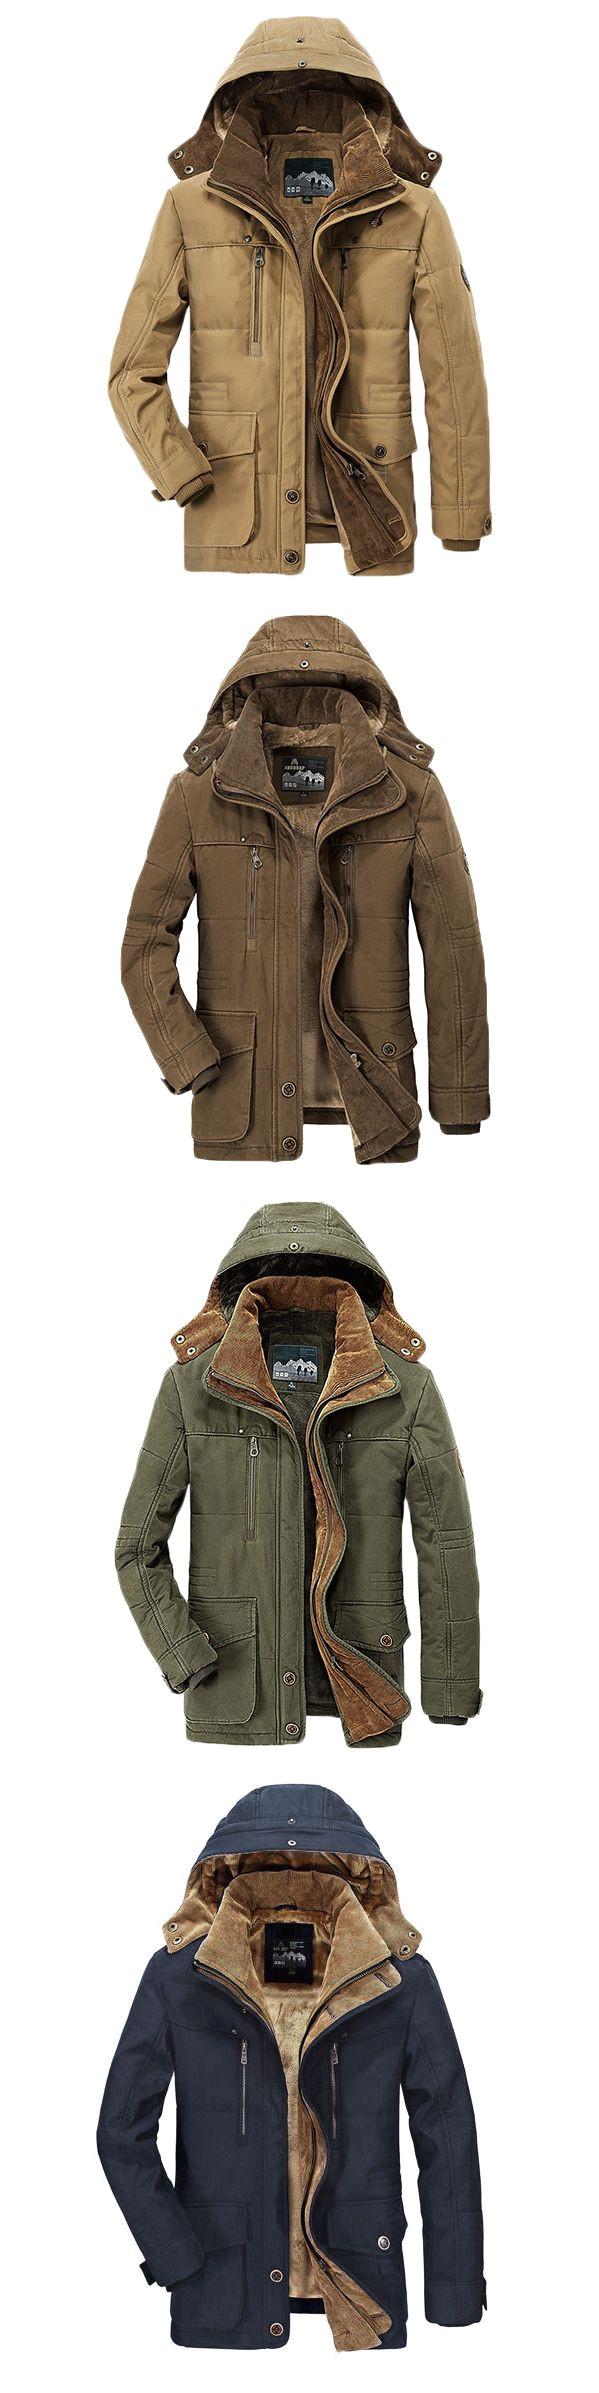 us 81 88 winter thicken warm multi pockets solid color detachable hood jacket for men